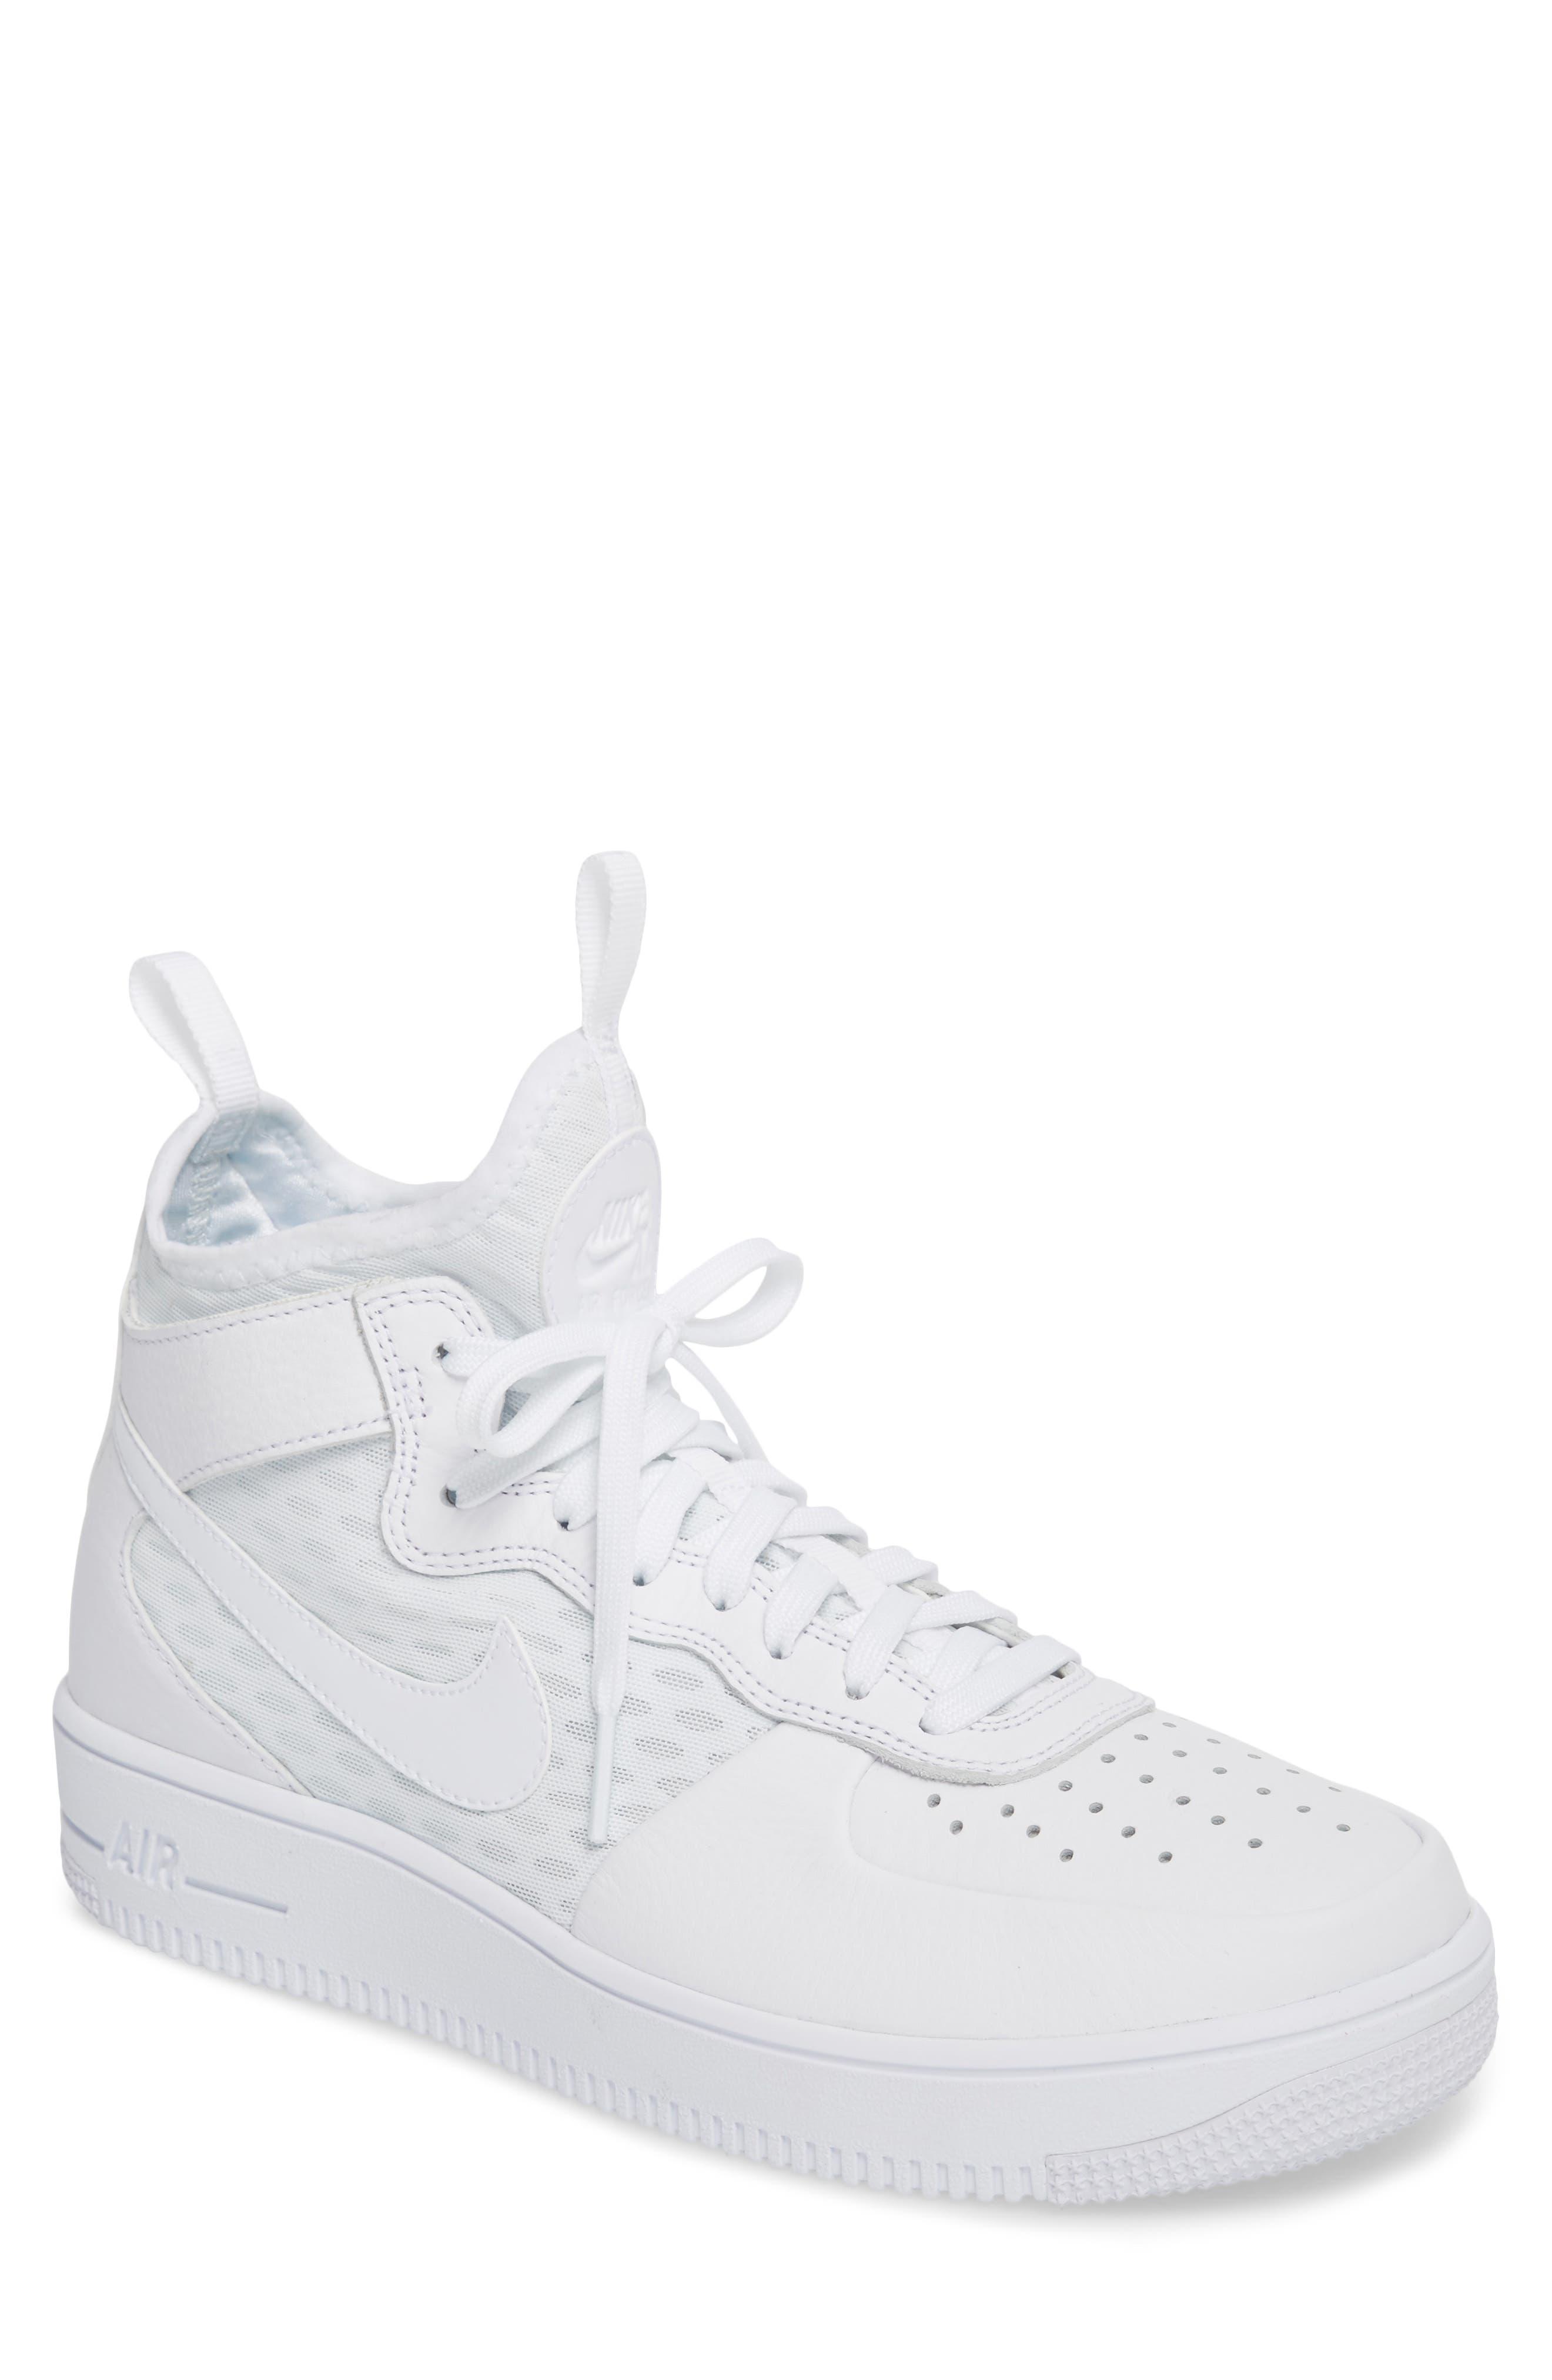 Nike Air Force 1 Ultraforce Mid Sneaker (Men)